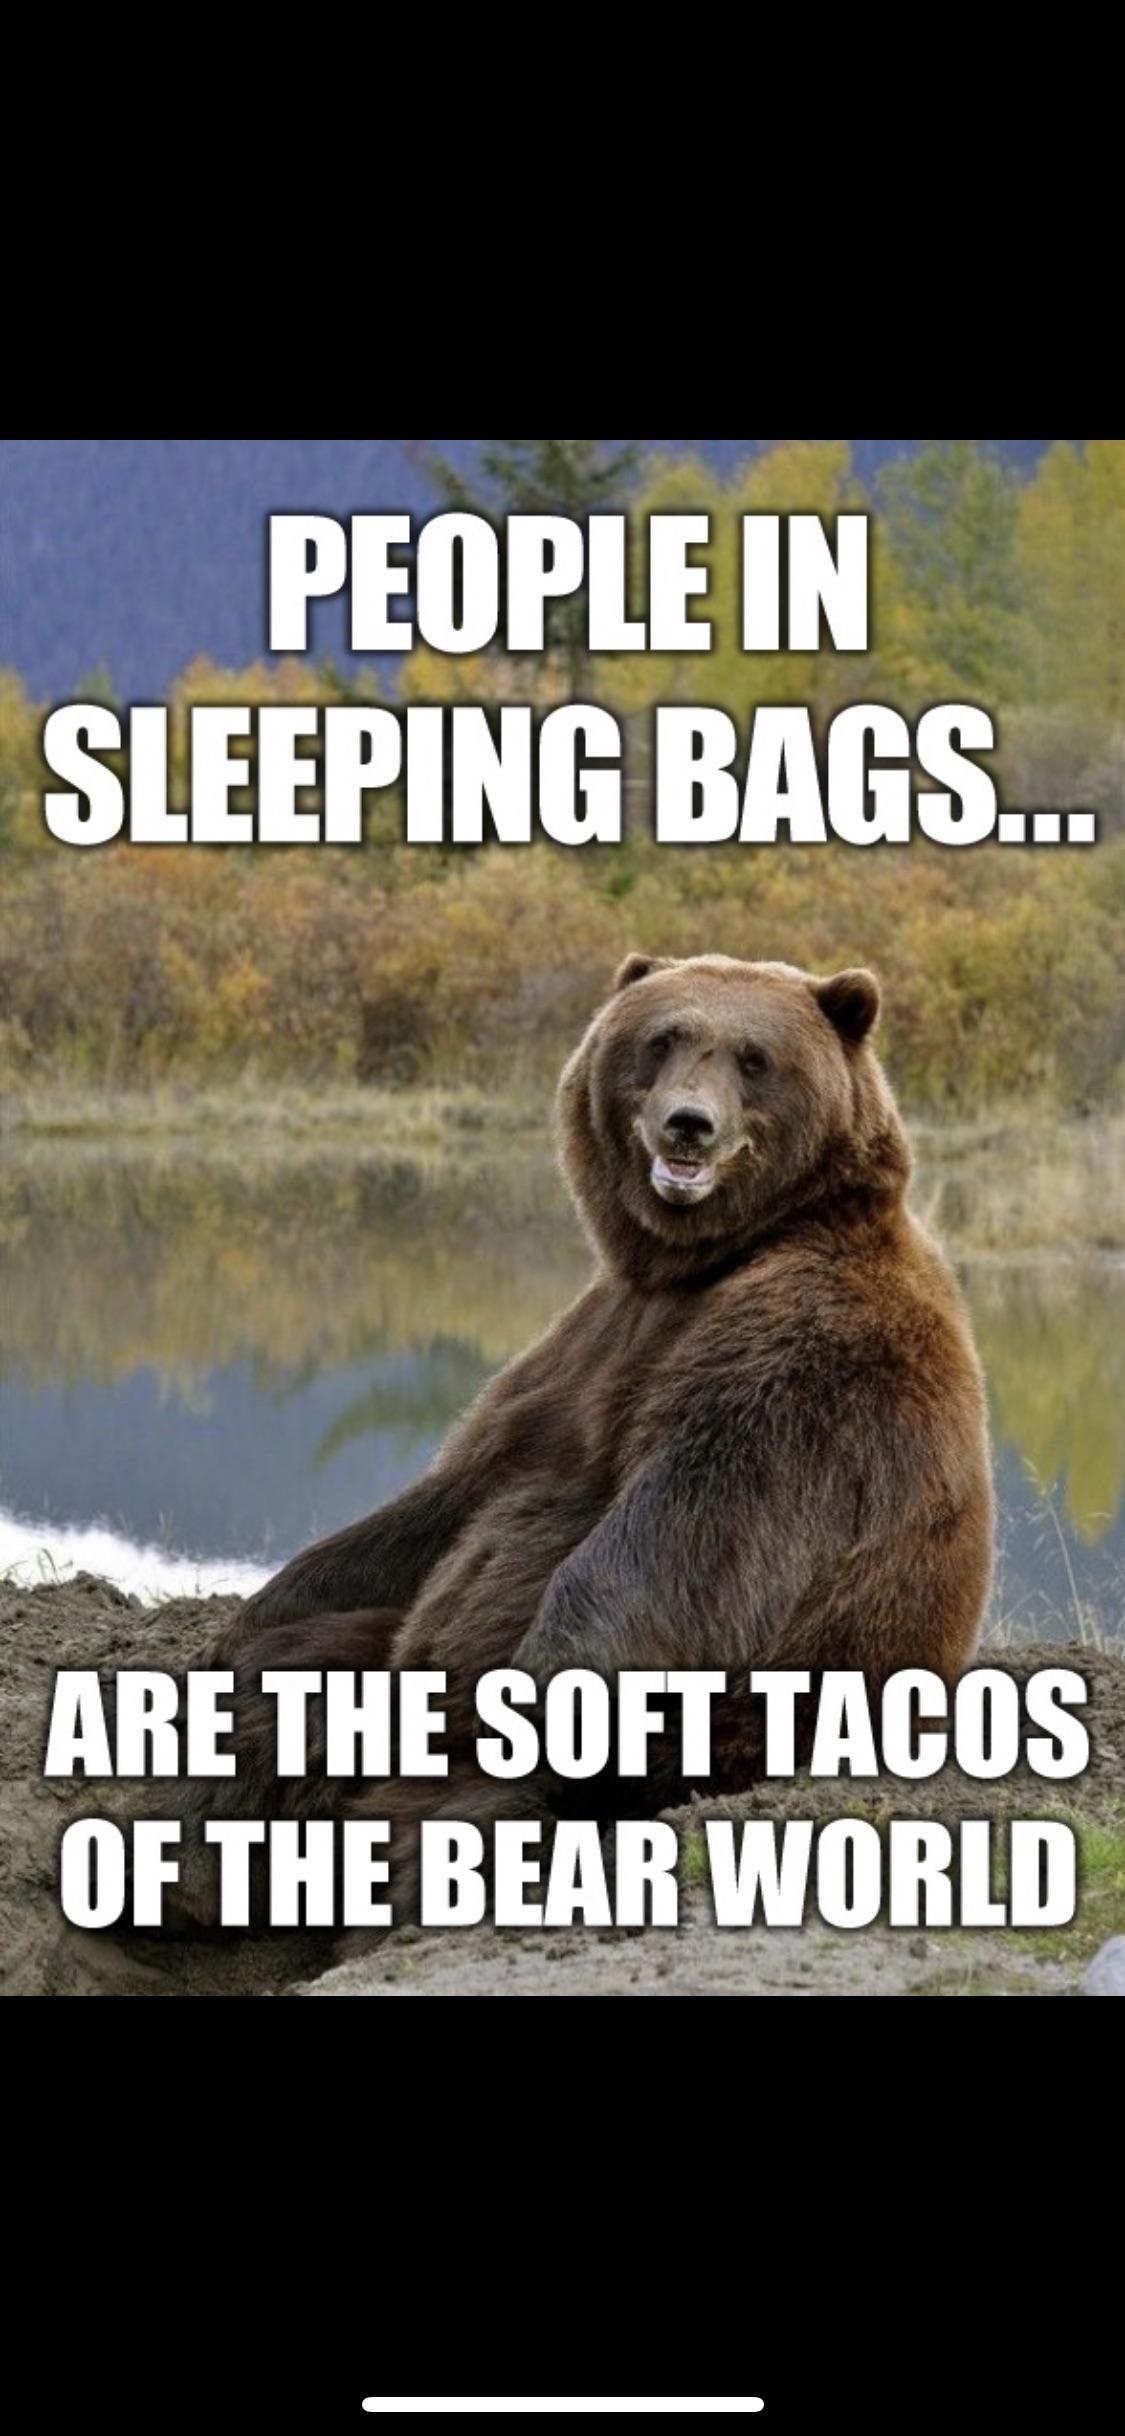 Mexican bears!